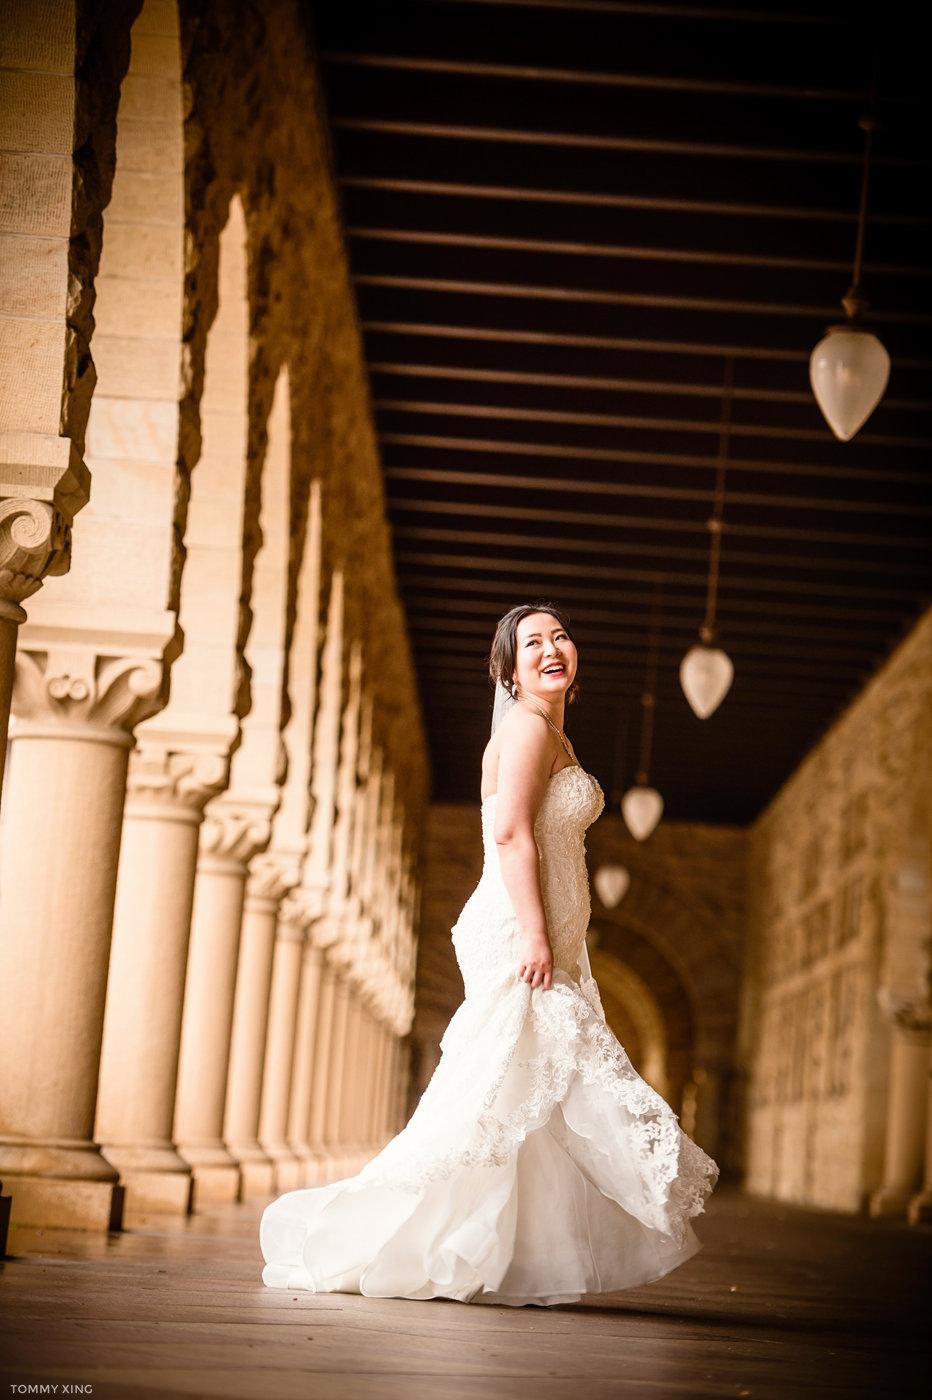 STANFORD MEMORIAL CHURCH WEDDING - Wenjie & Chengcheng - SAN FRANCISCO BAY AREA 斯坦福教堂婚礼跟拍 - 洛杉矶婚礼婚纱照摄影师 Tommy Xing Photography151.jpg